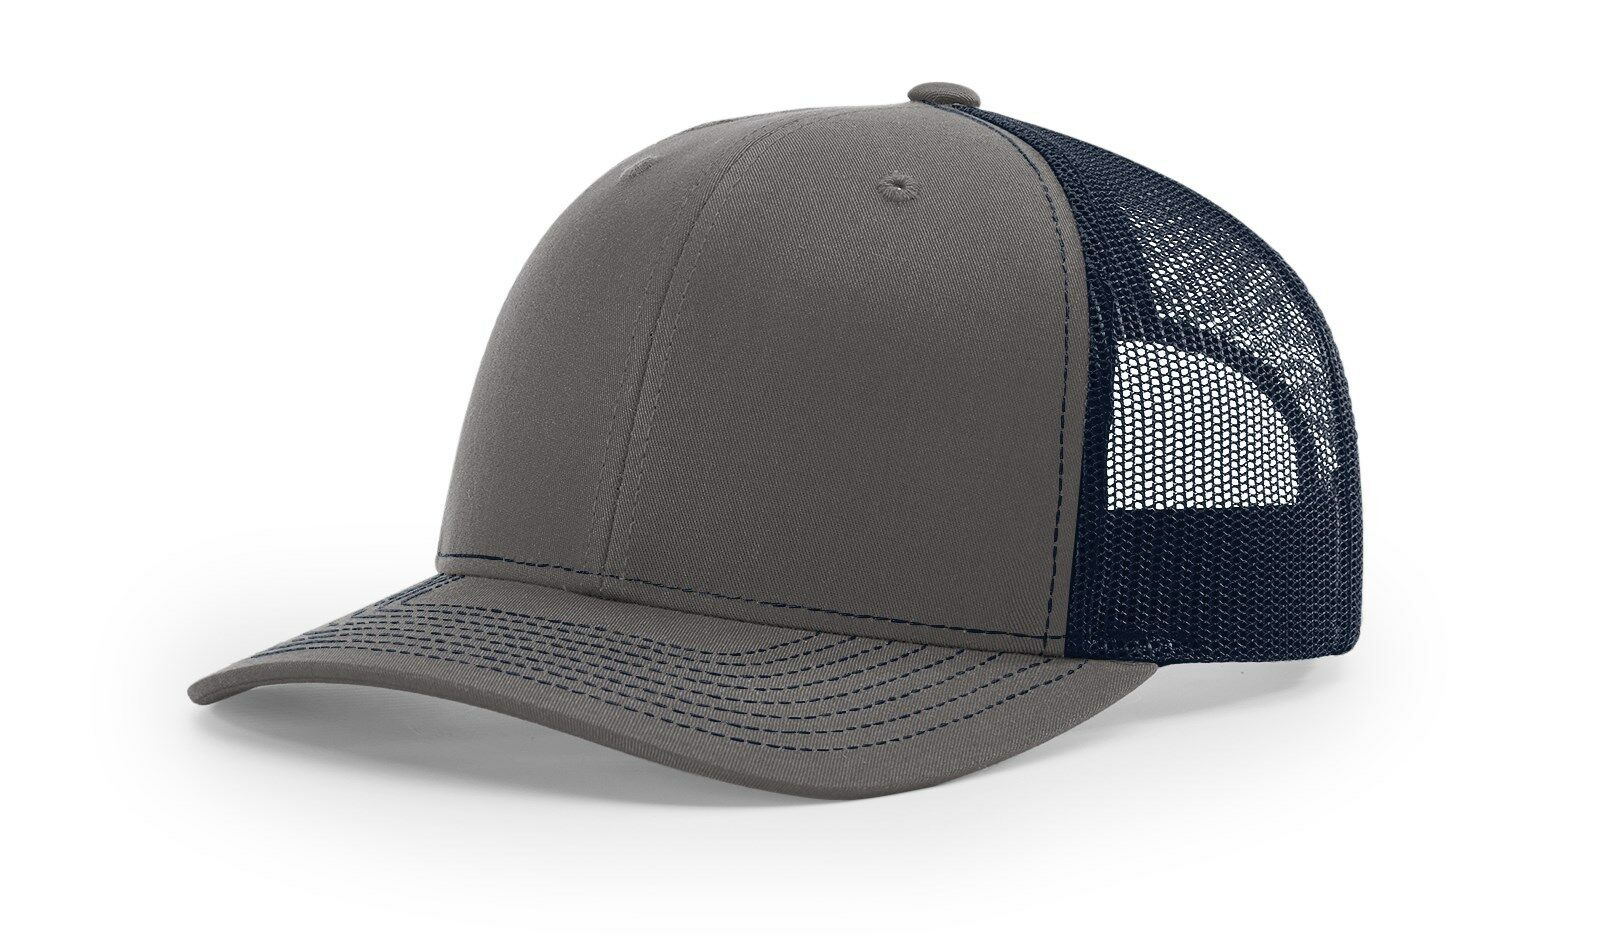 New Richardson 112 Trucker Ball Cap Mesh Hat Adjustable ...